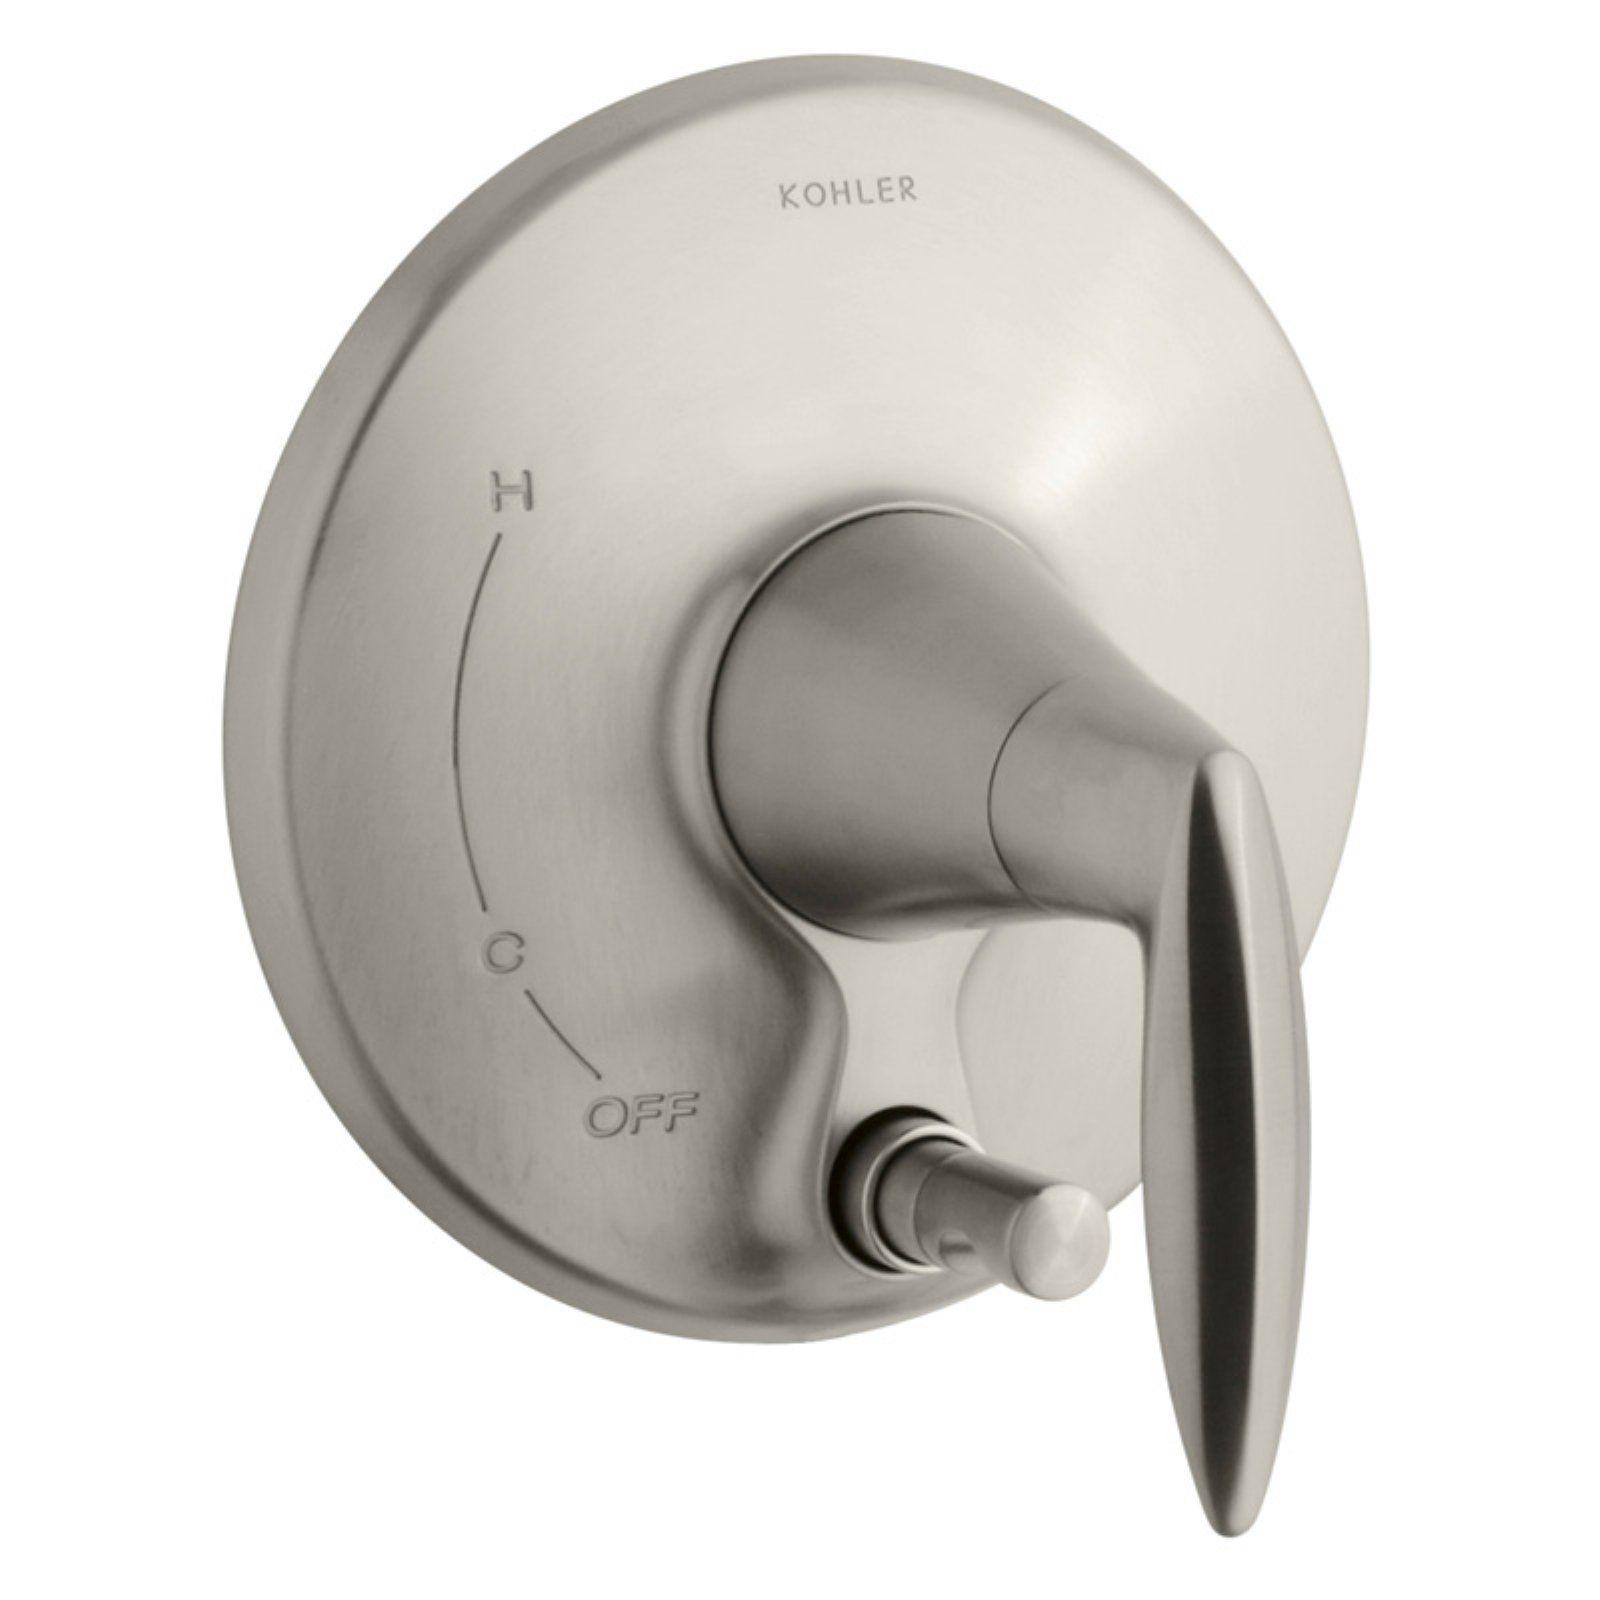 Kohler Alteo Kt45112 4 Valve Trim With Push Button Diverter